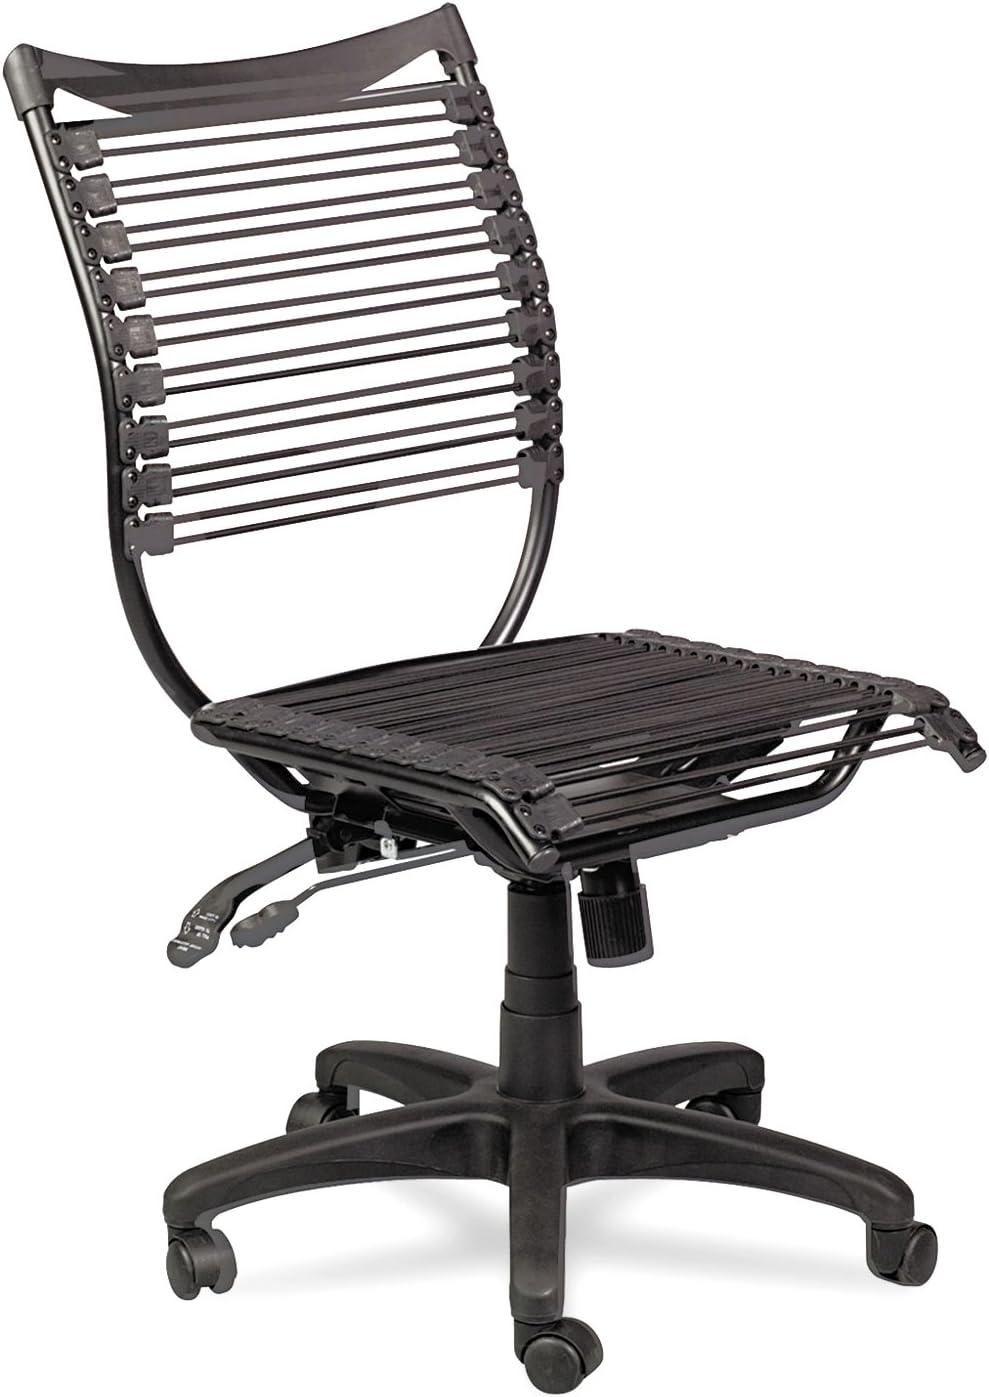 Balt Seatflex Managerial Office Chair